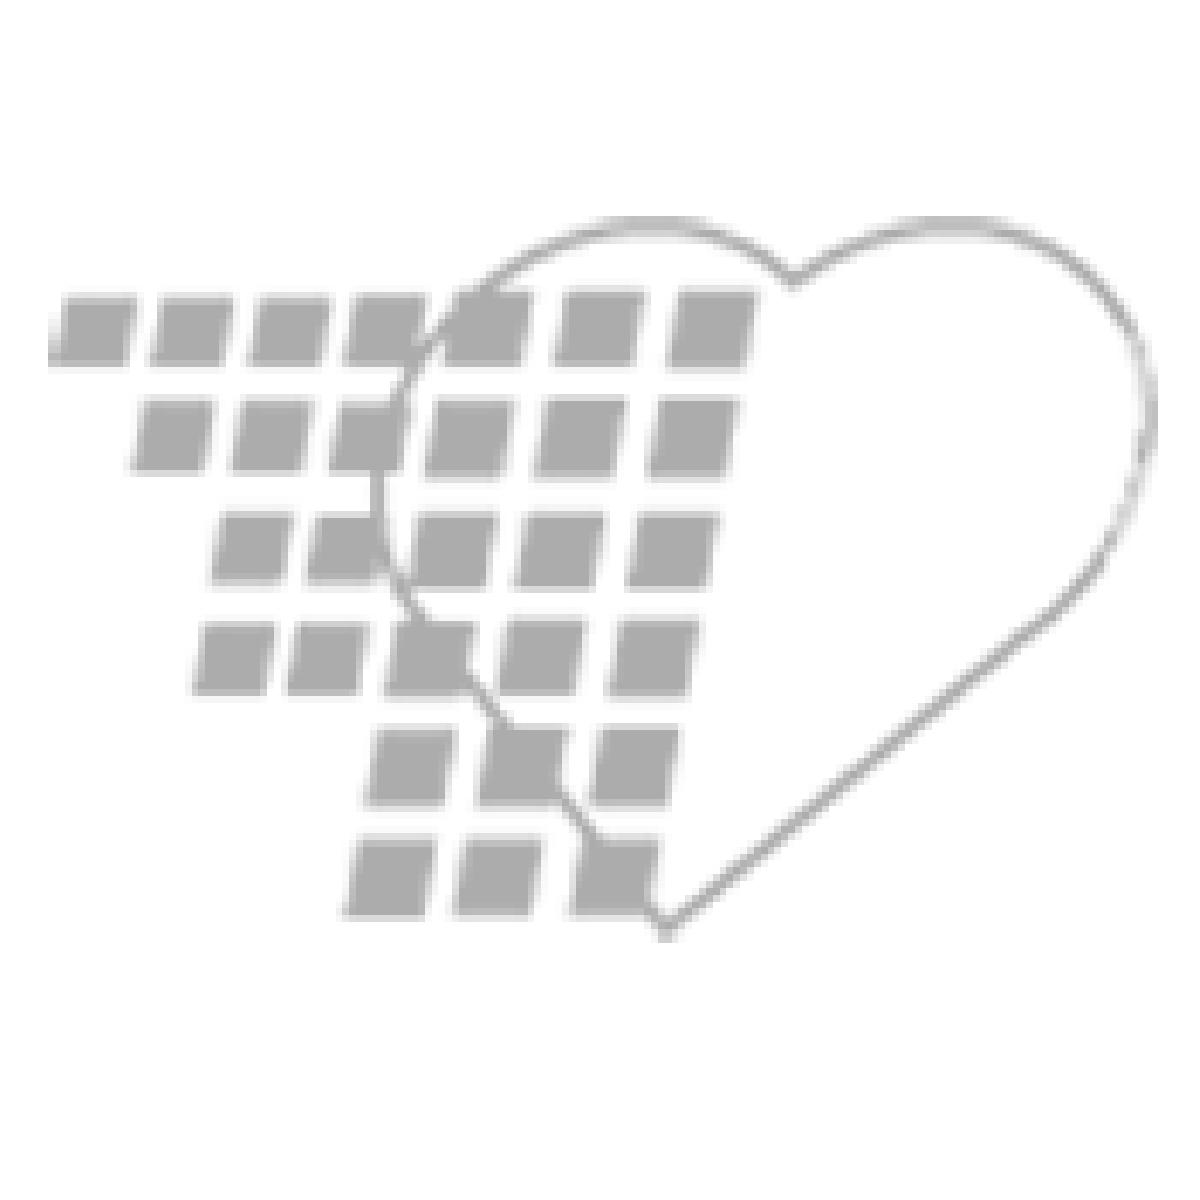 05-02-1106 - Alcohol Prep Pad Sterile - large